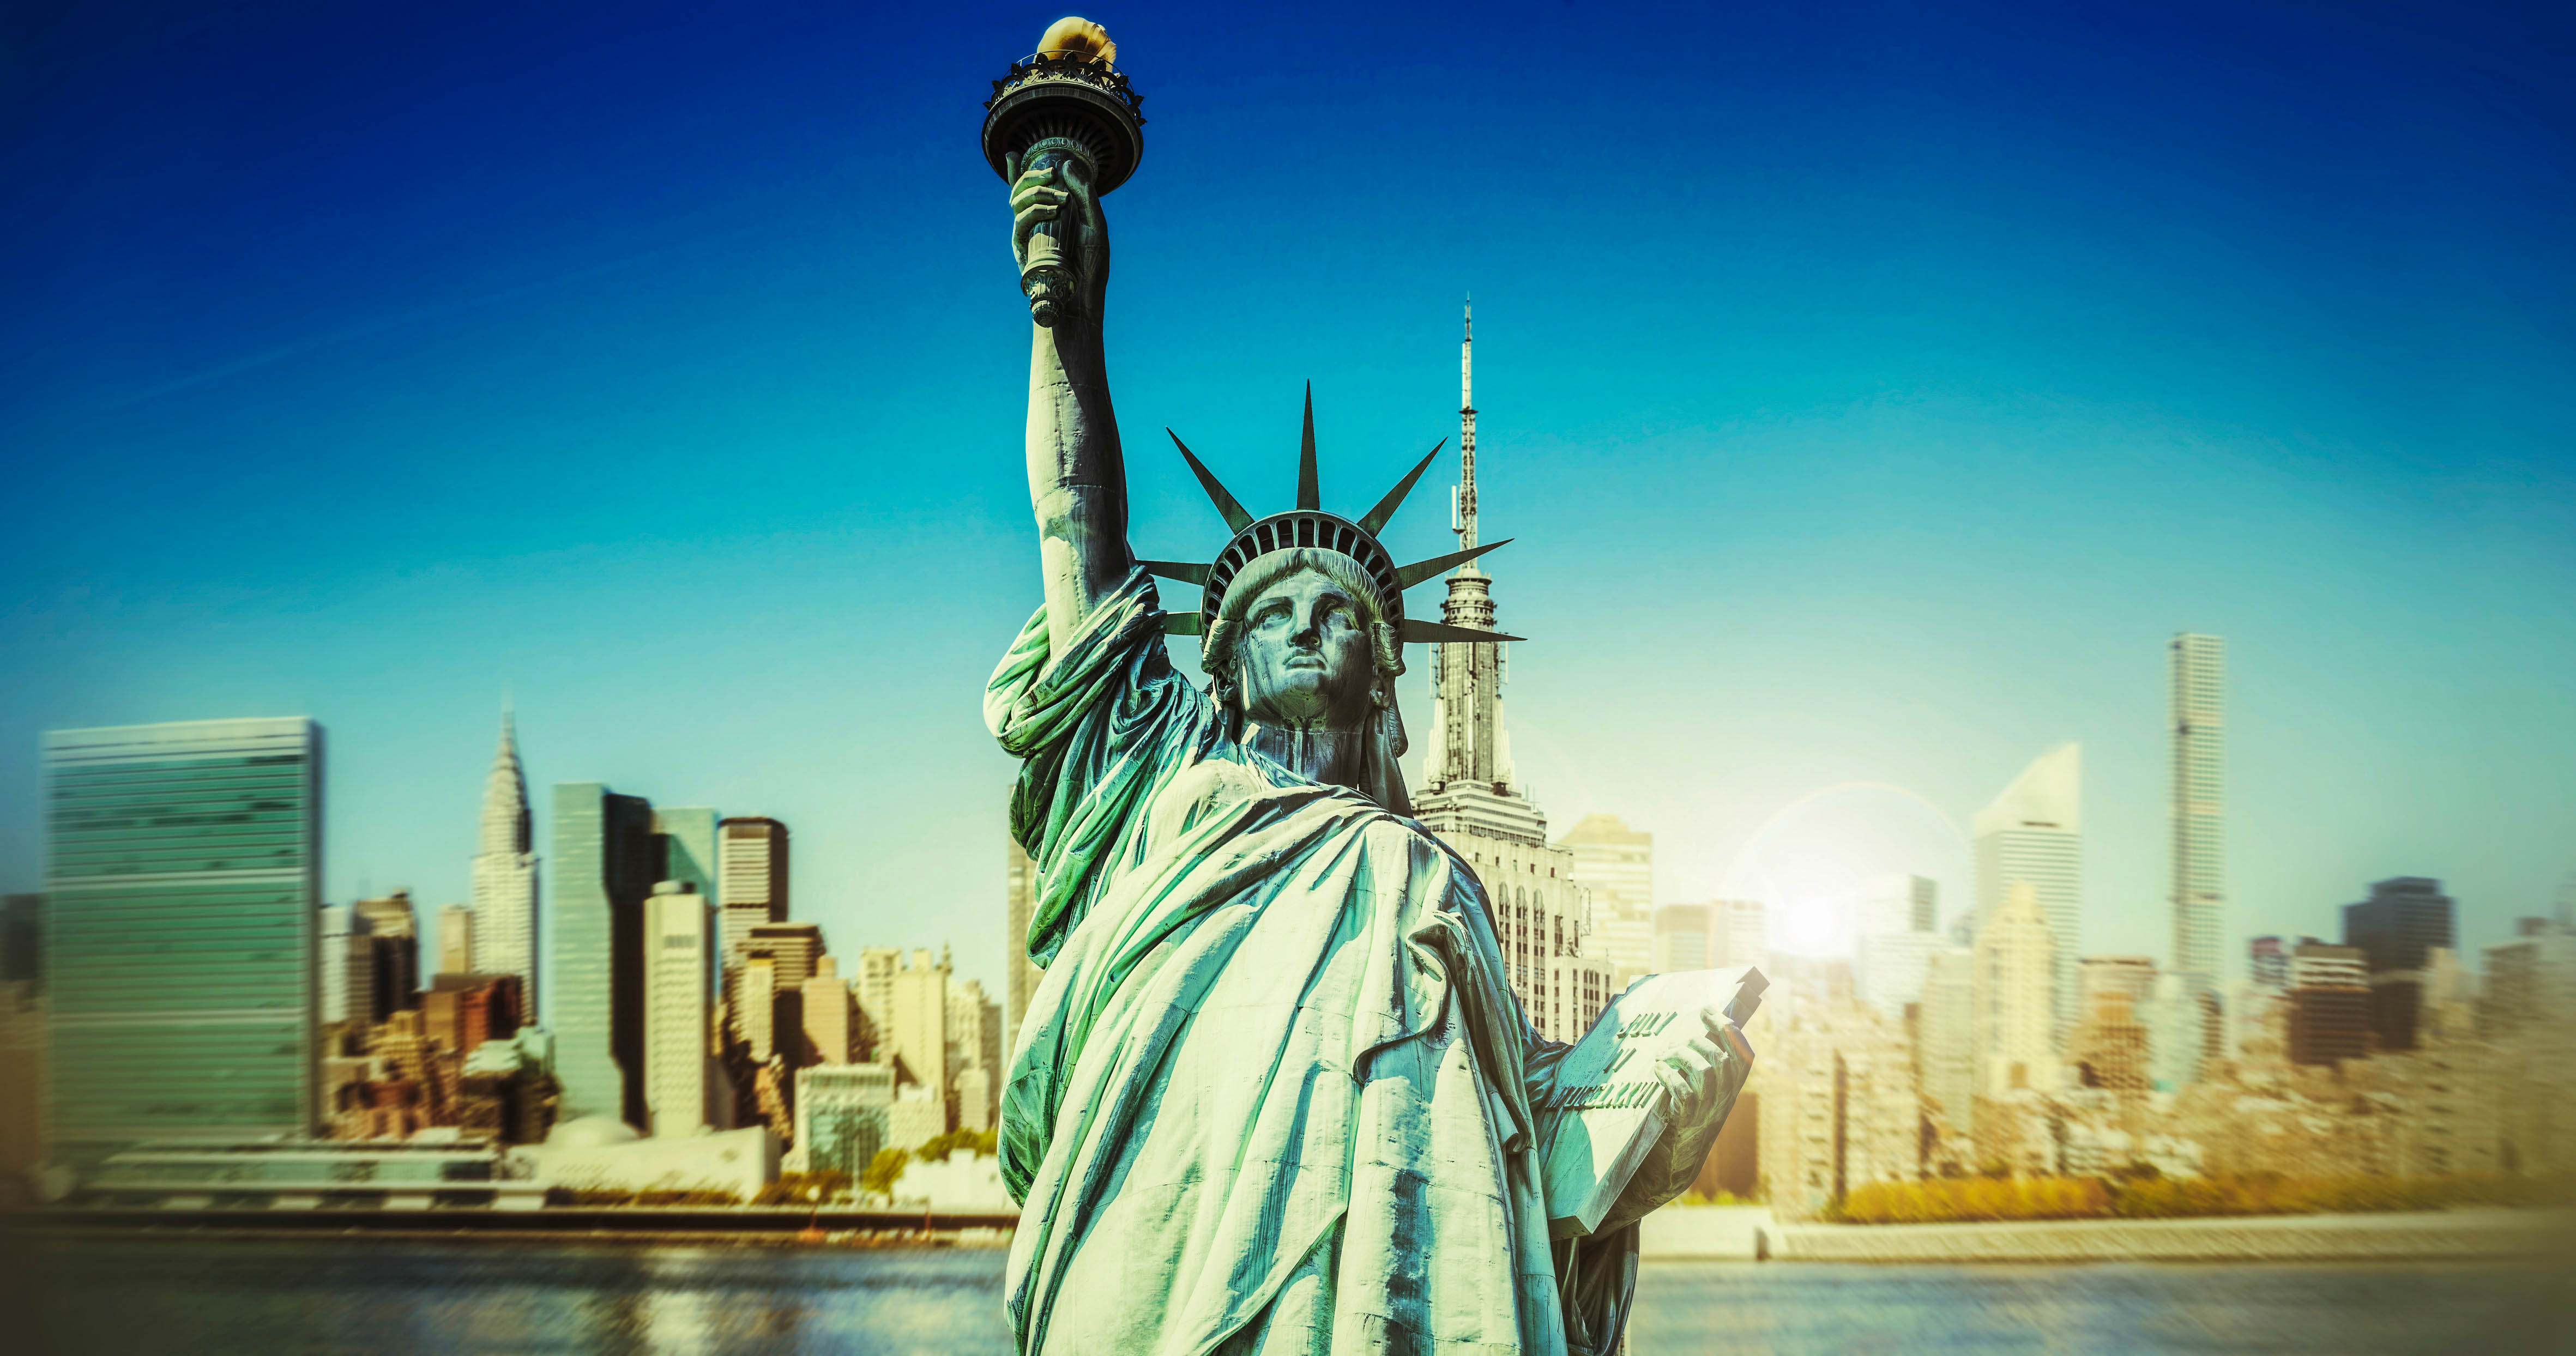 St u00e4dtereise nach New York   5 Tage im top Hotel f u00fcr 614 u20ac